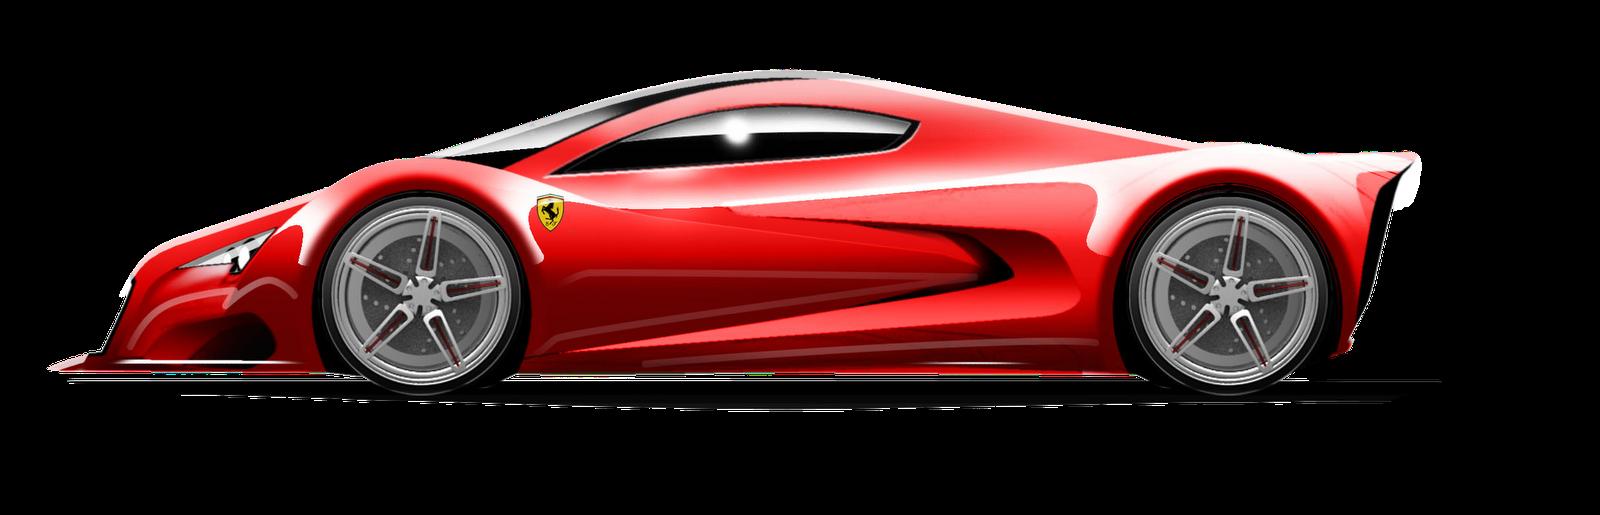 Ferrari Transparent Image Ferrari Car Ferrari Car